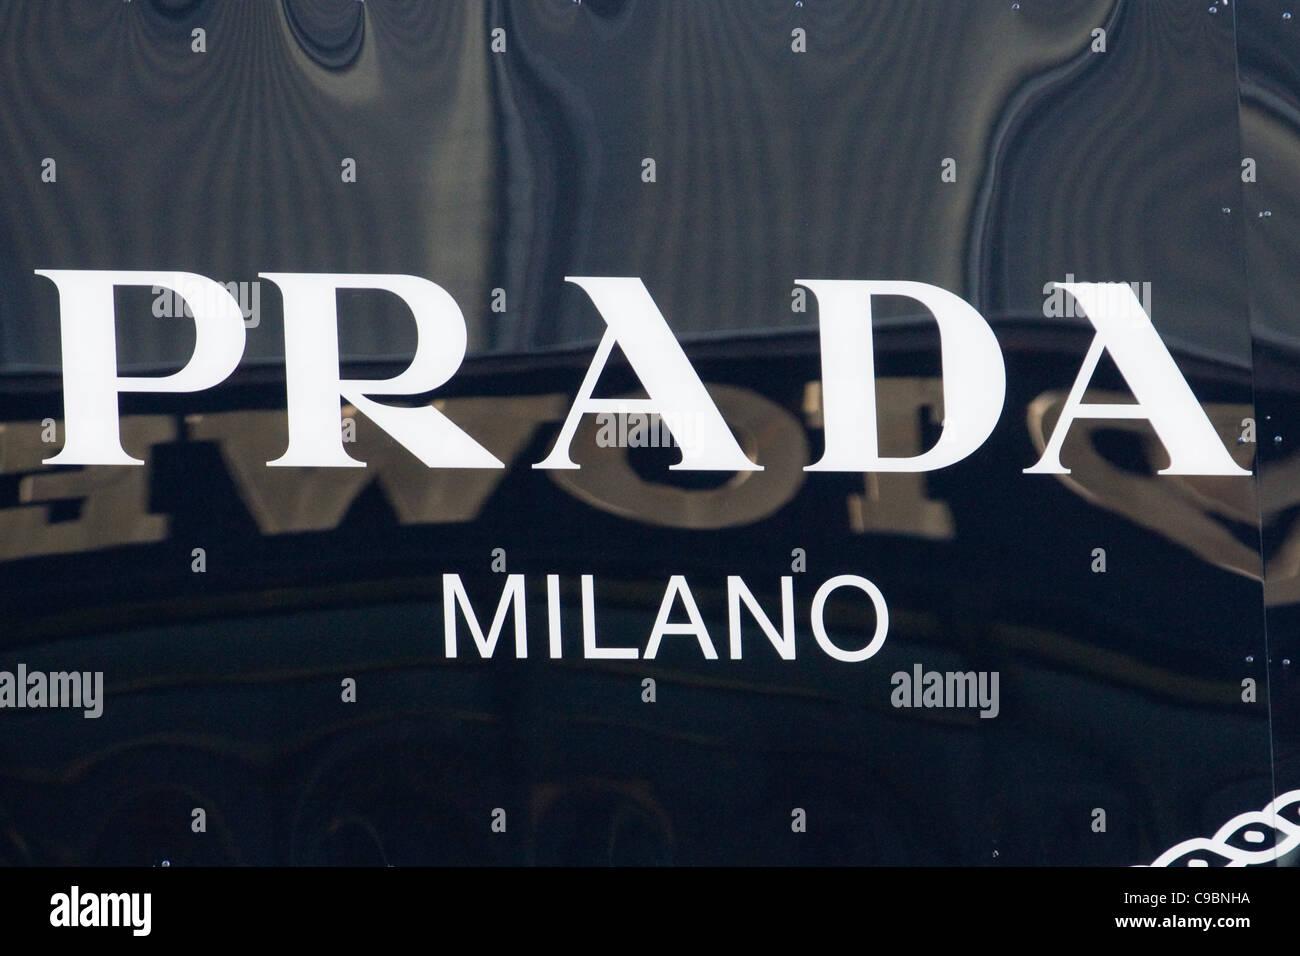 9b1439d99a1 Prada Milano Famous Designer shop on Fifth avenue New York City USA ...